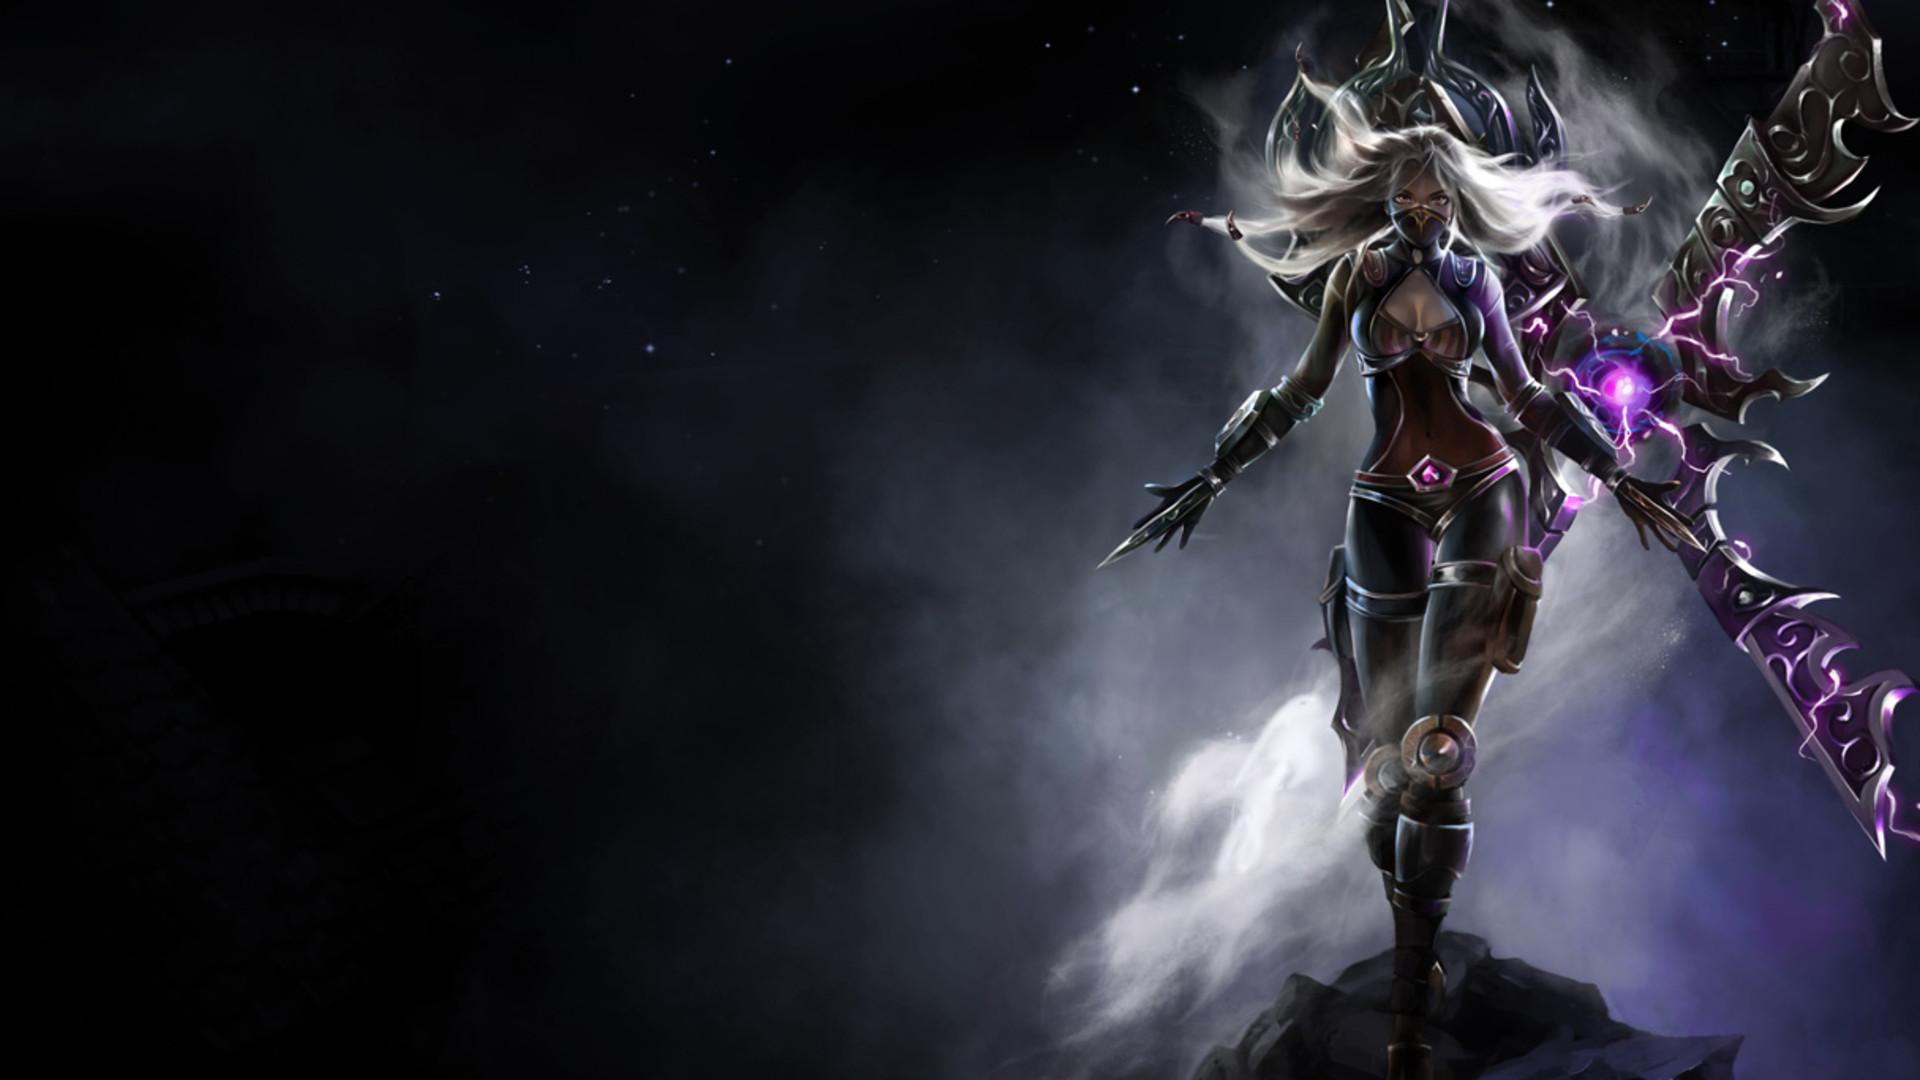 Dark Purple fantasy female warrior wallpaper from Warriors wallpapers